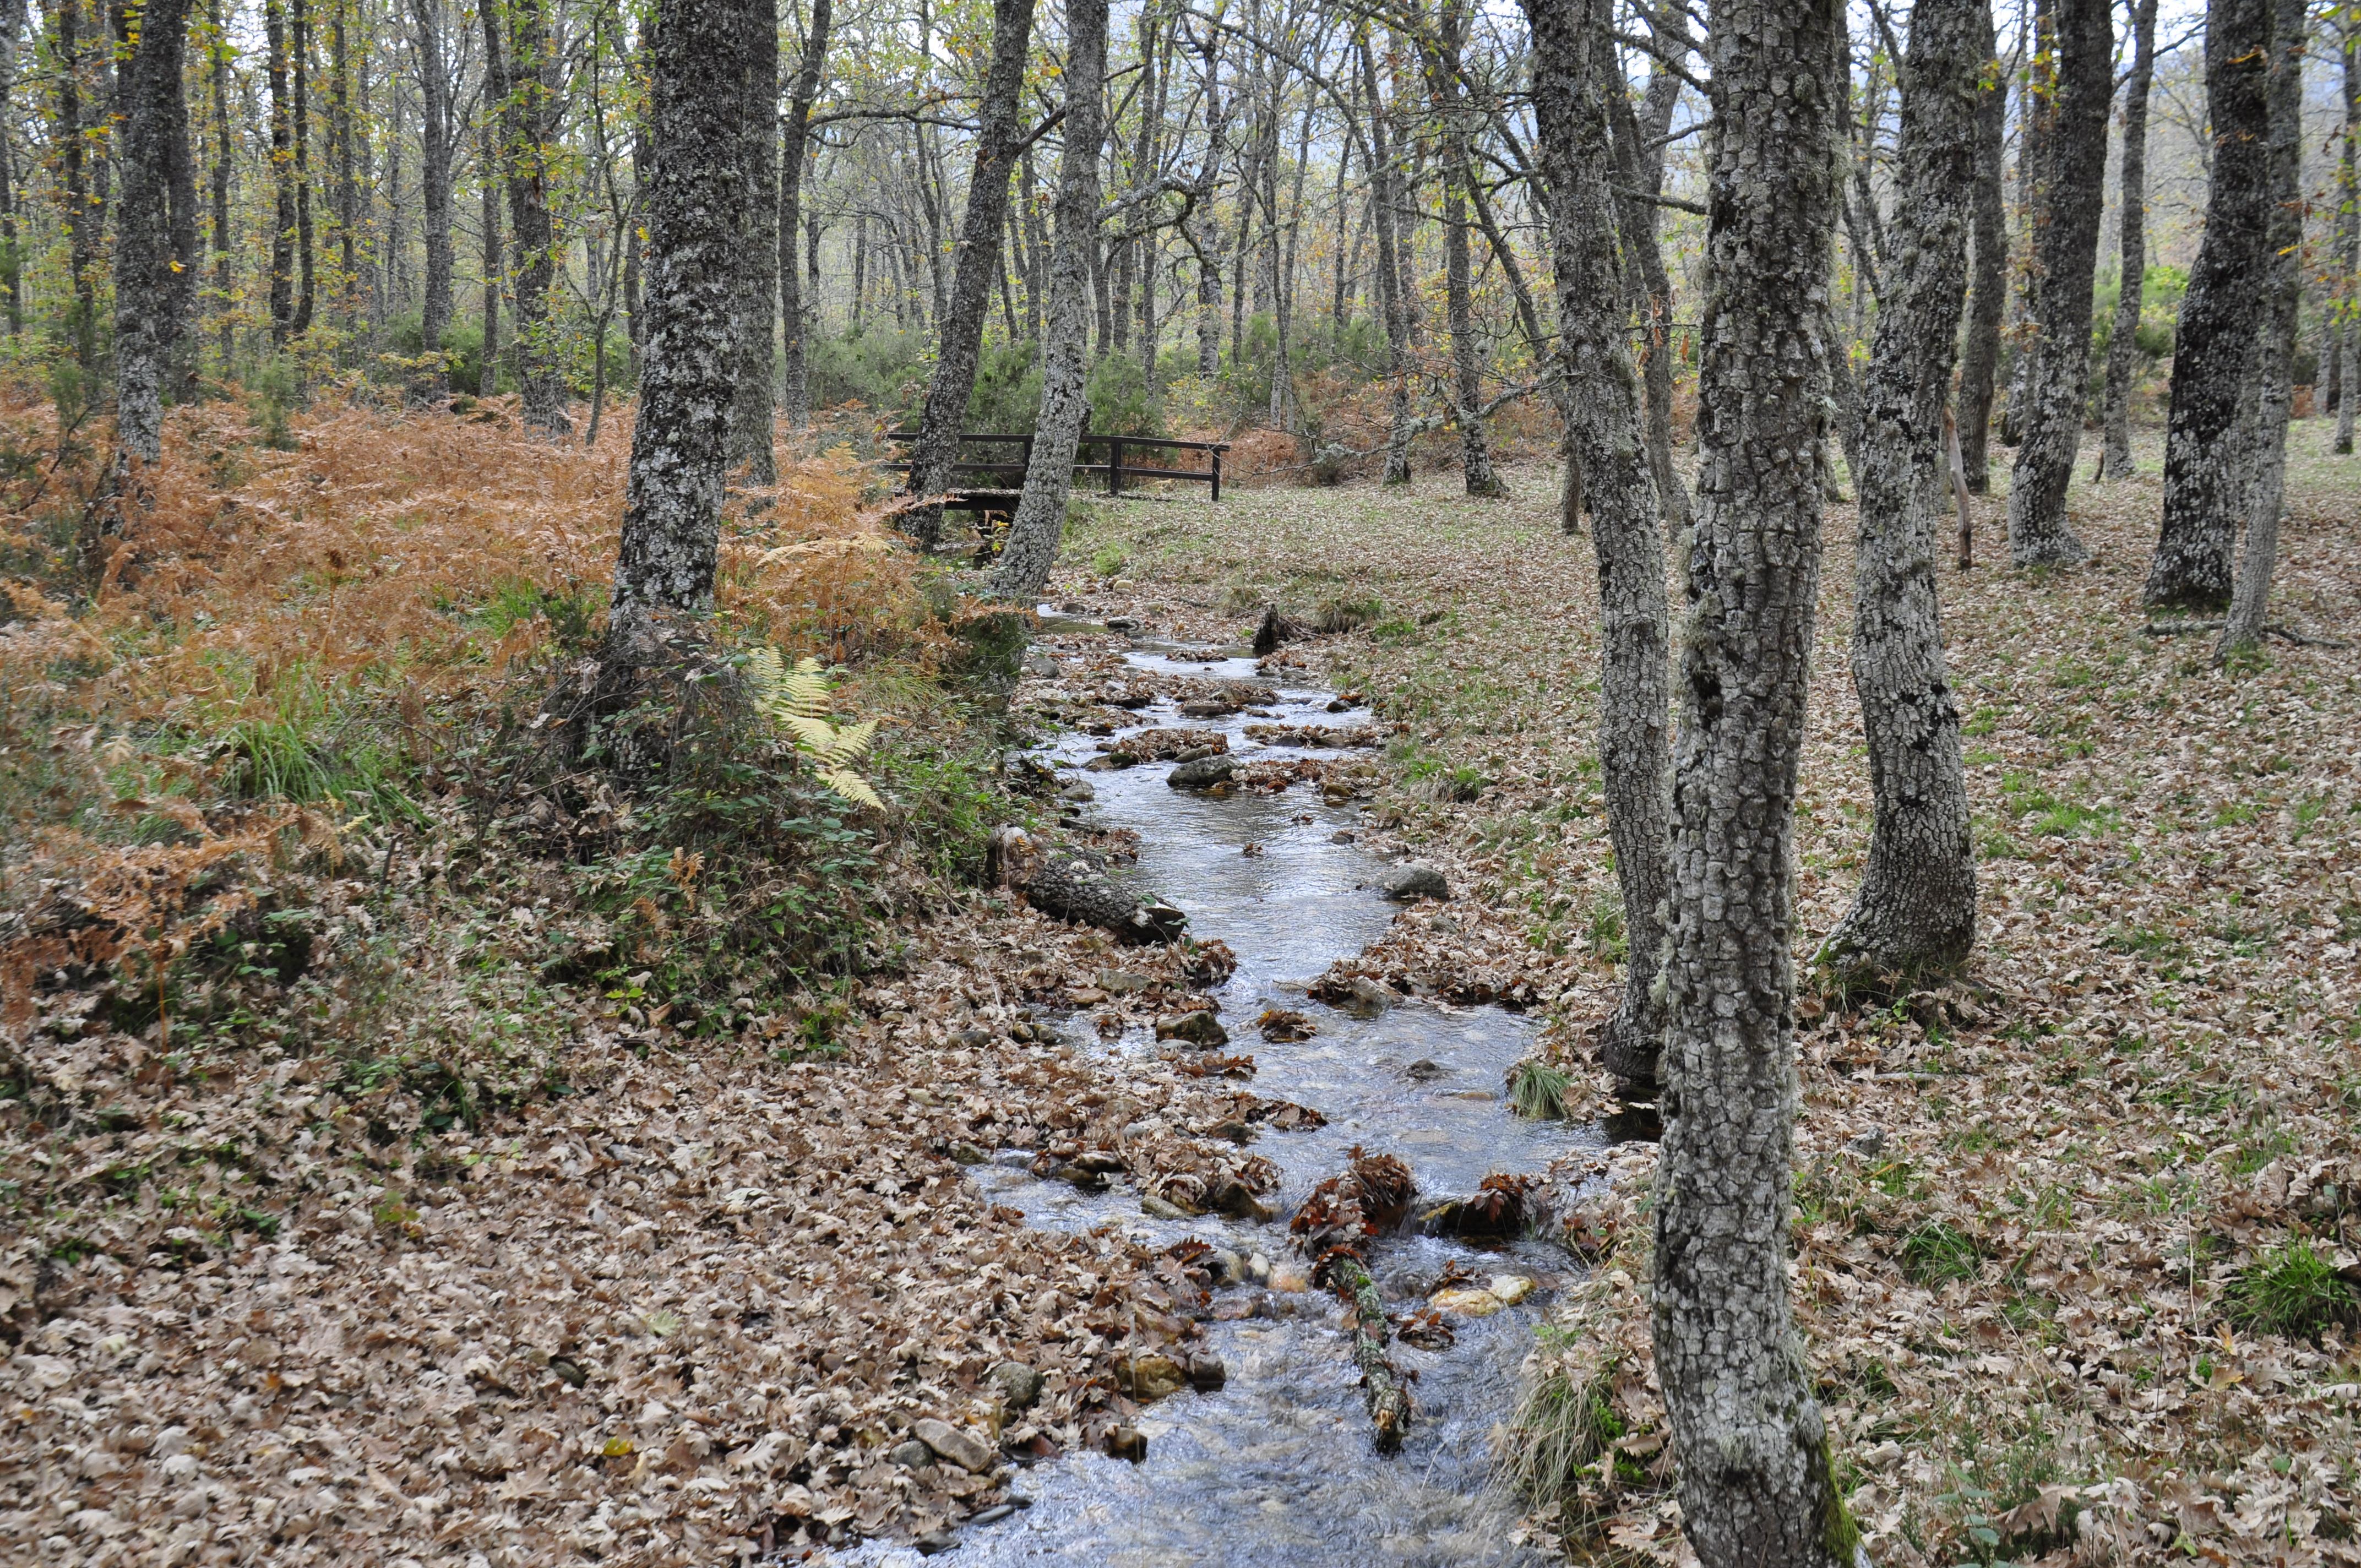 Arroyo de la Barranca o Gabín, Forest, Landscape, Naturaleza, Outdoor, HQ Photo